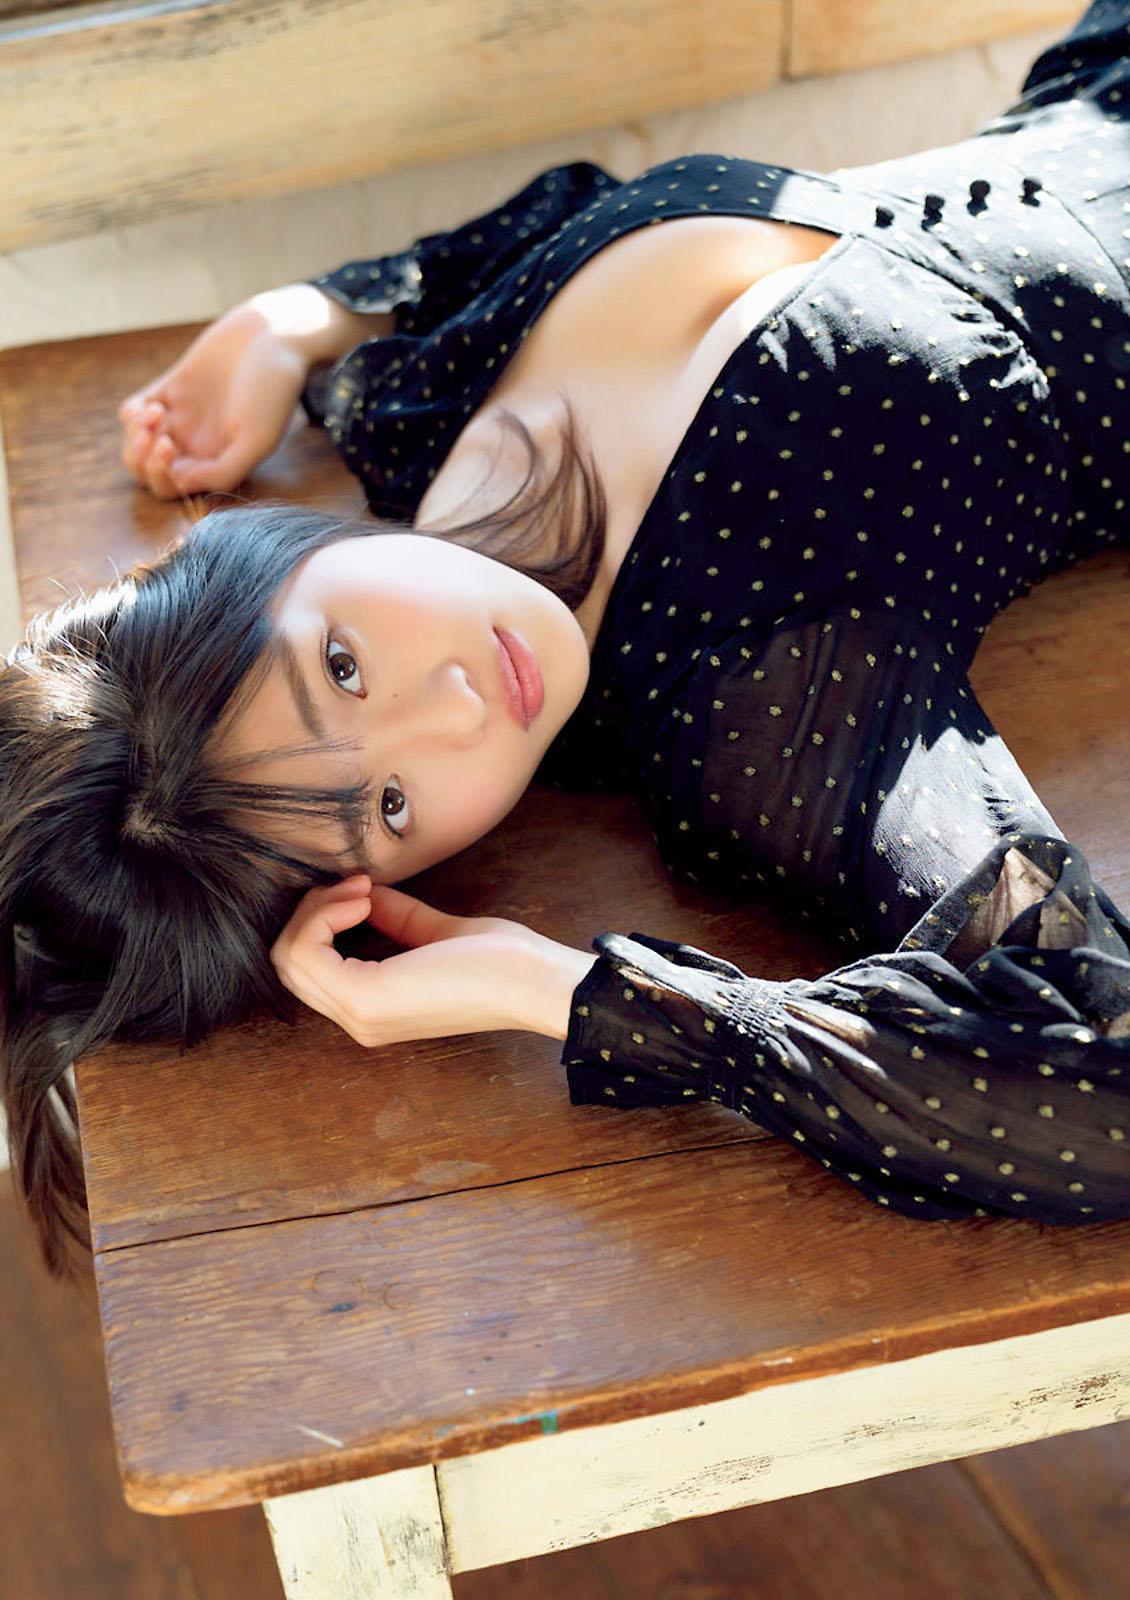 Momoka Ishida Big Comic Spirits 210208 09.jpg